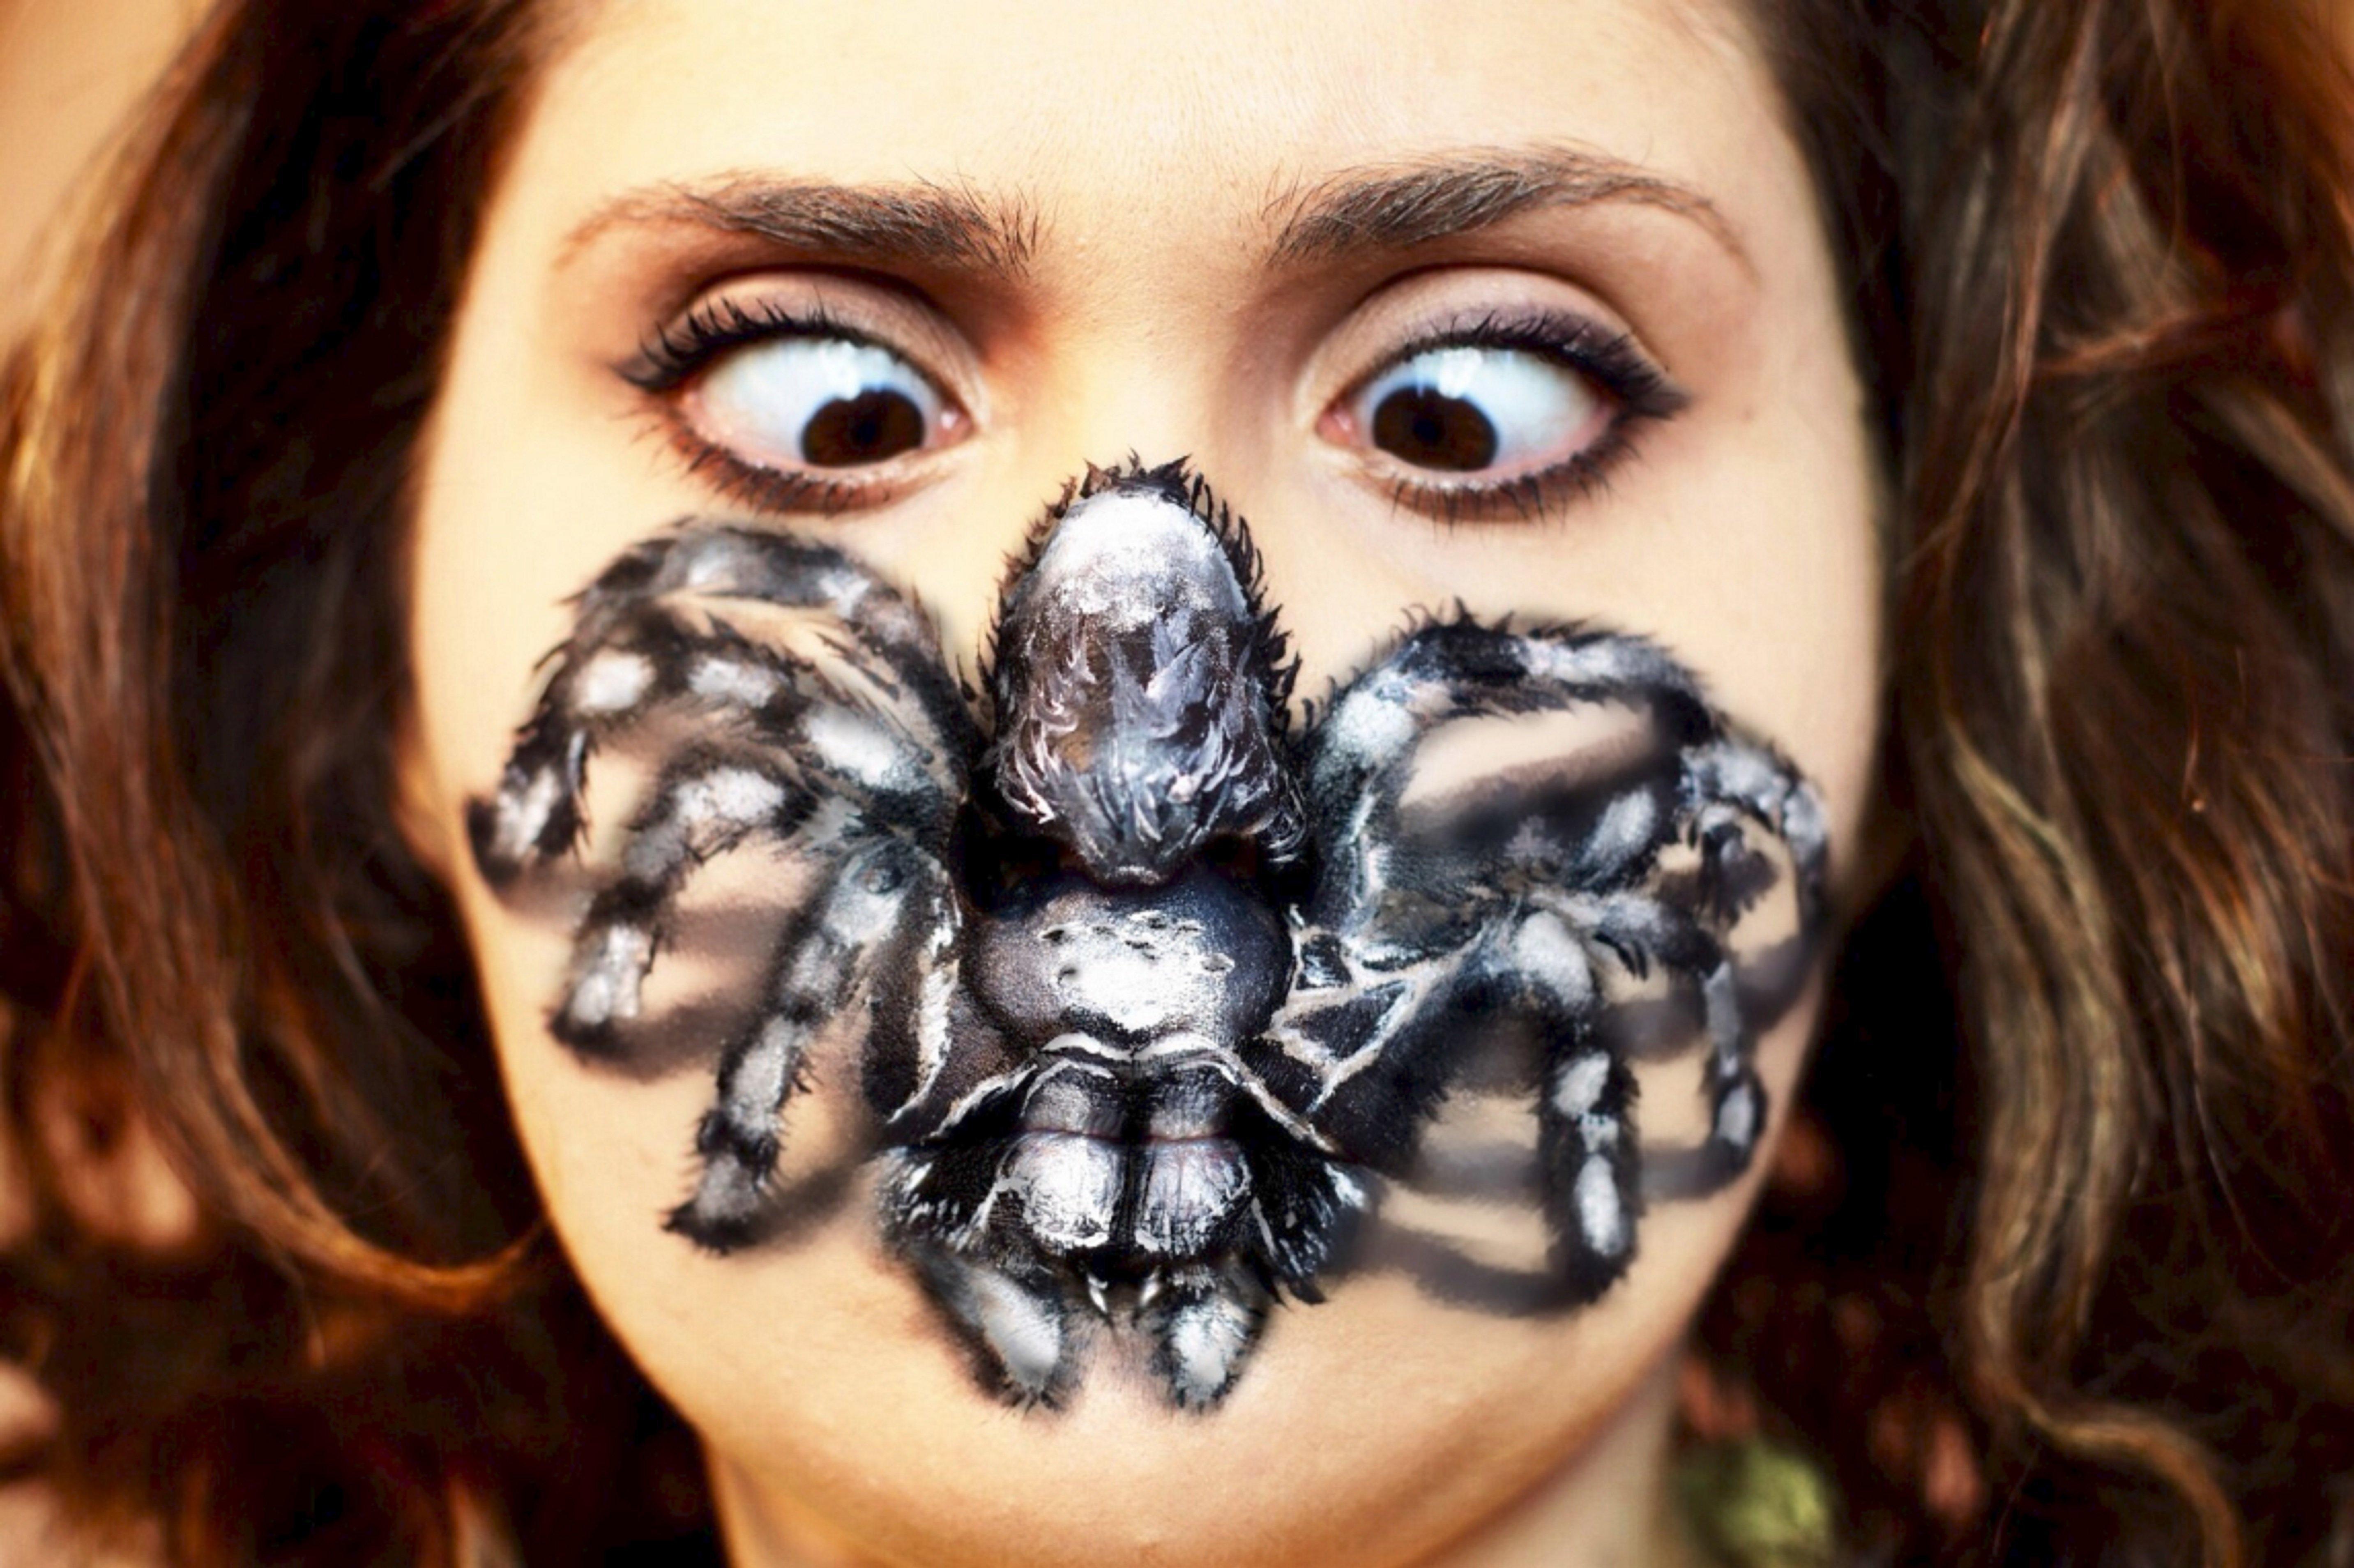 Les illusions hallucinantes d'Elena Martini